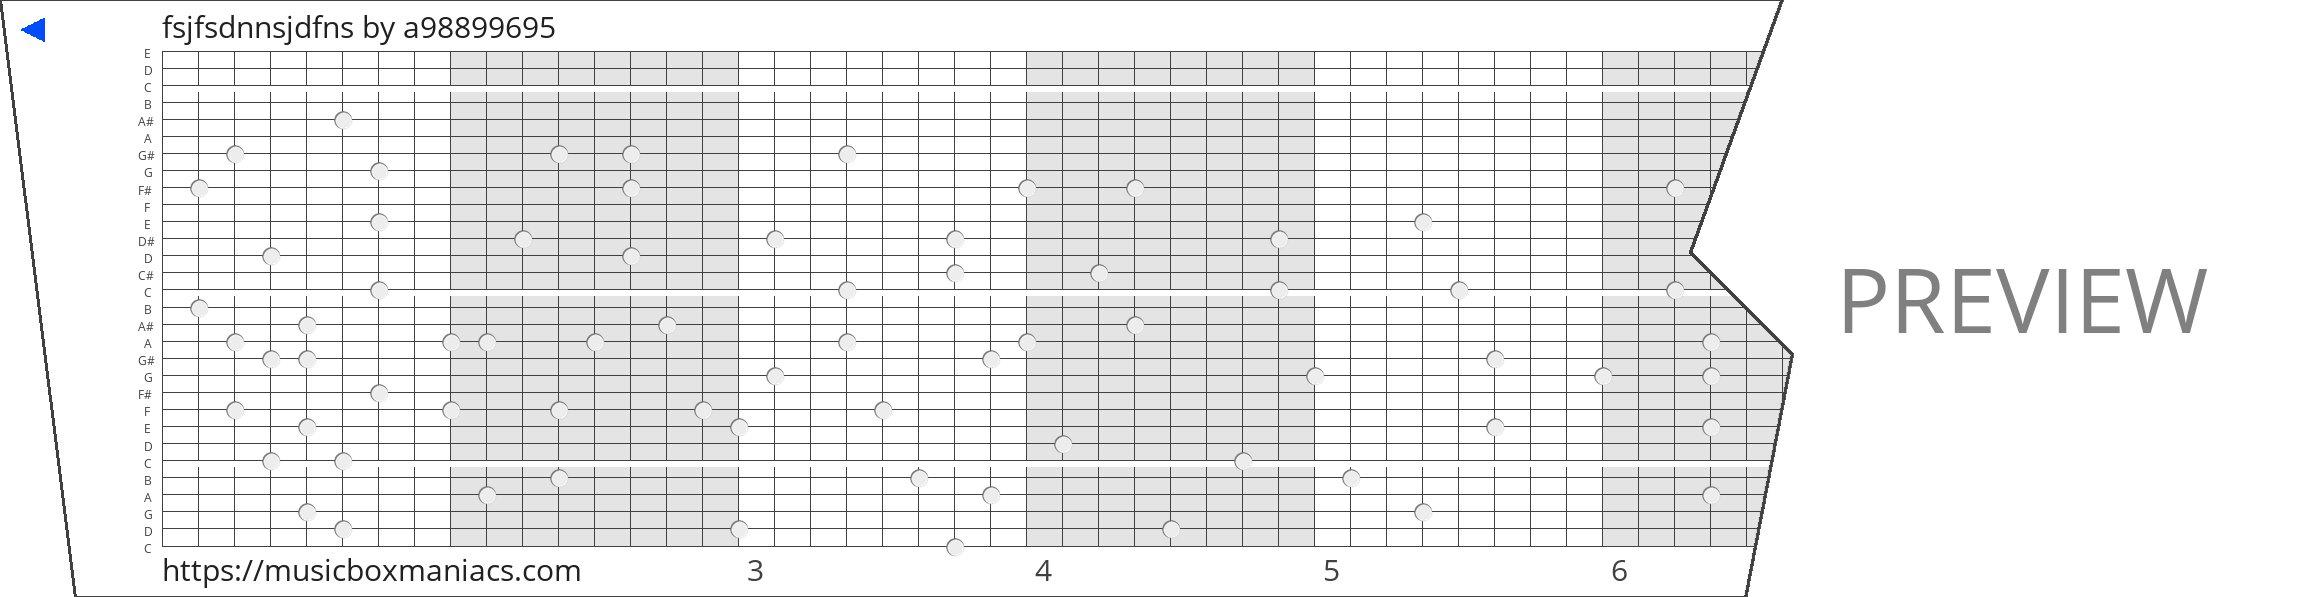 fsjfsdnnsjdfns 30 note music box paper strip